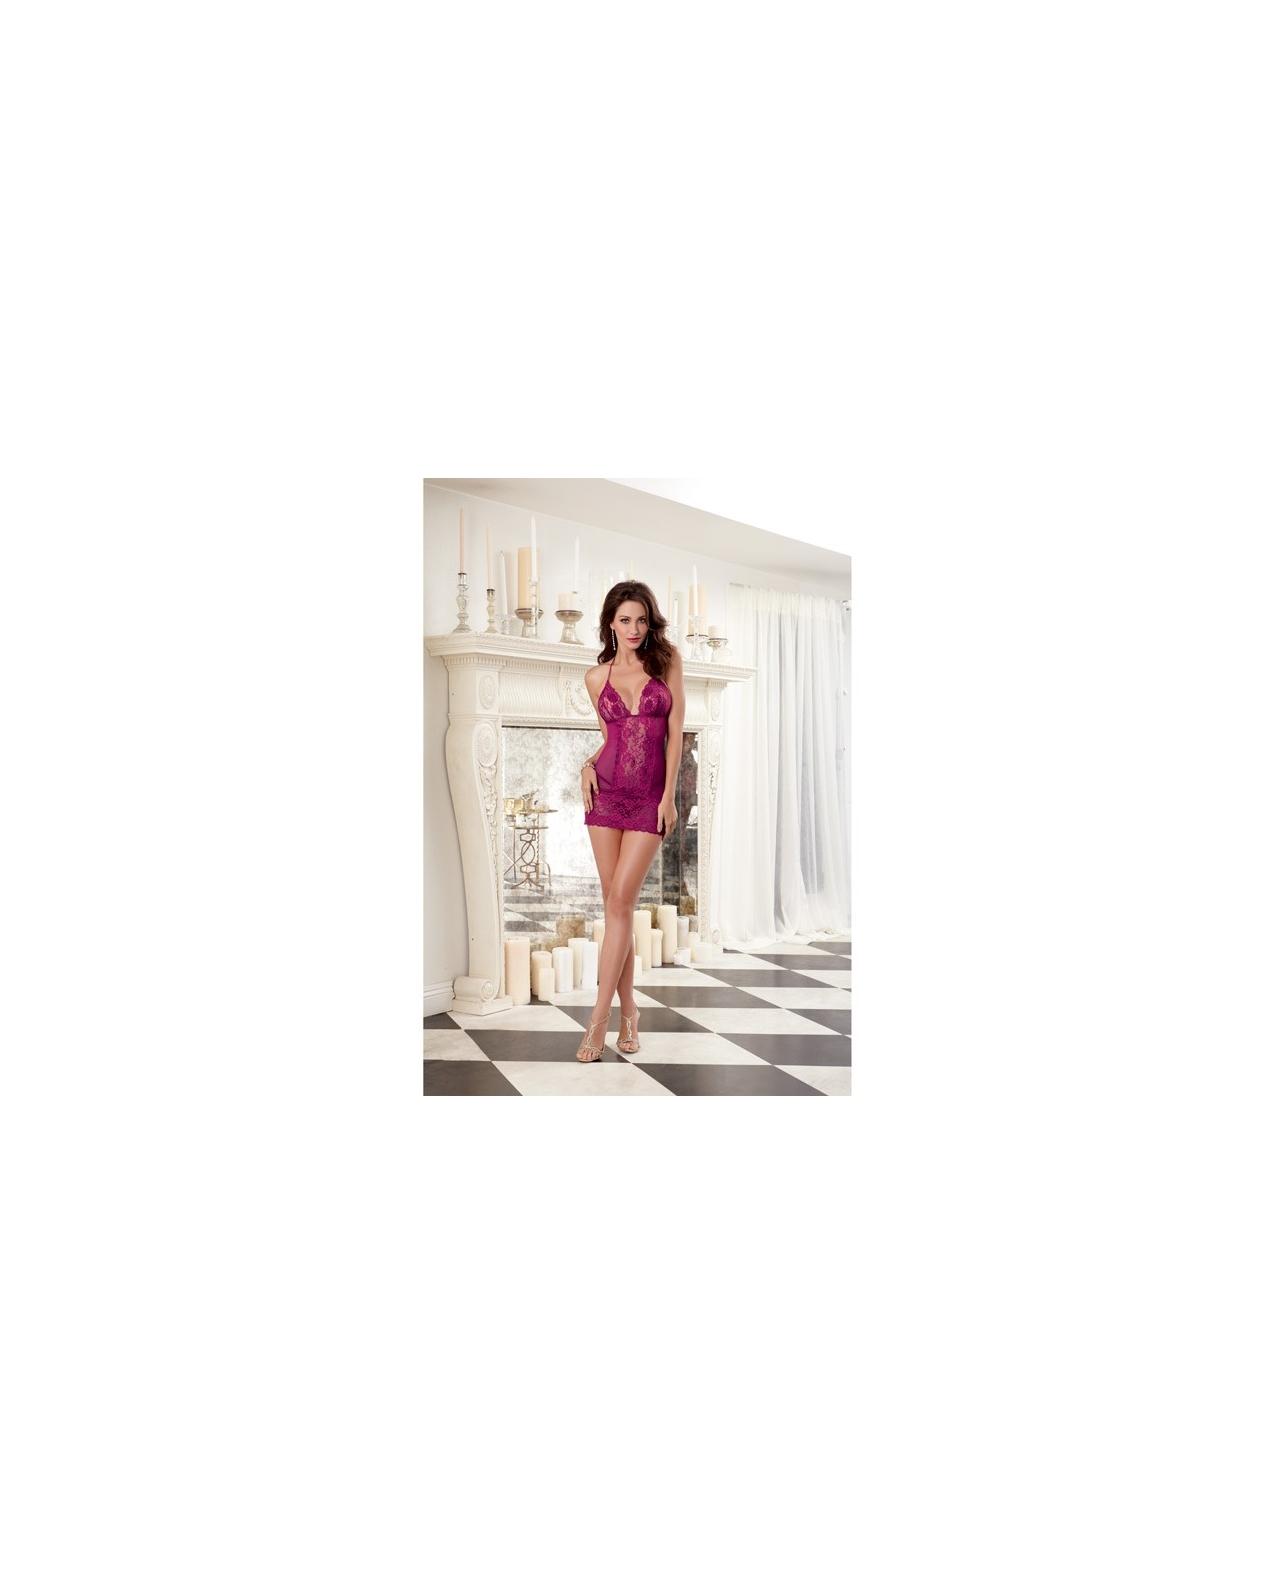 Stretch Lace Galloon & Stretch Mesh w/Spandex Halter Chemise w/Lace Hem & Thong Raspberry MD